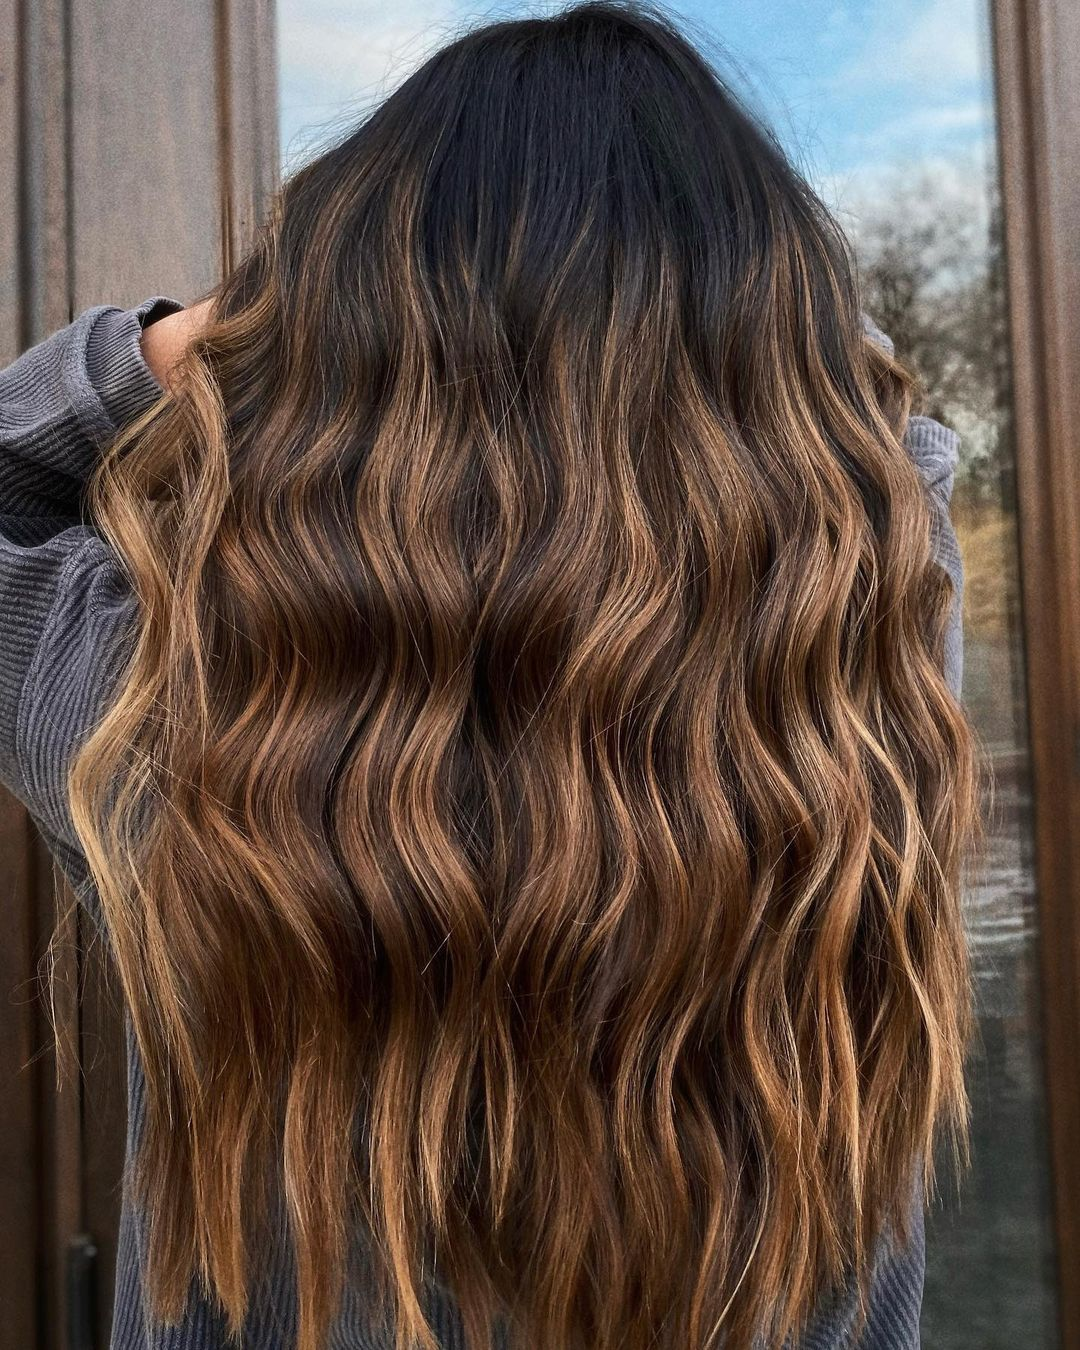 Dark Brunette Hair with Golden Highlights